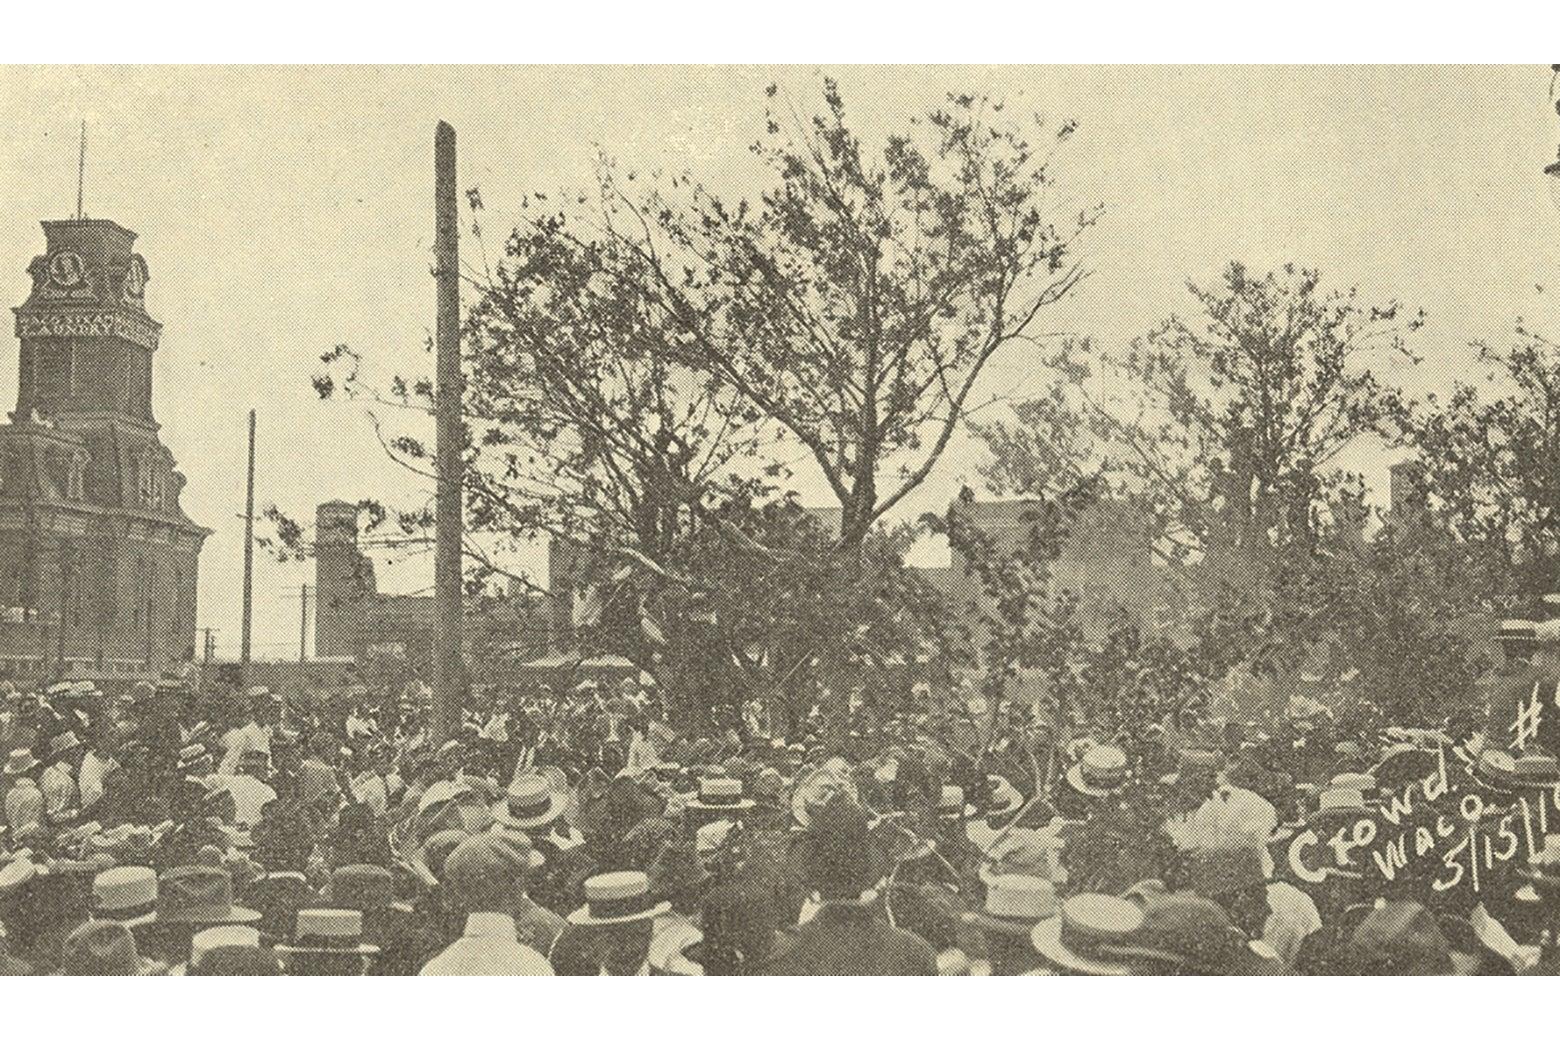 A crowd behind Waco's city hall.